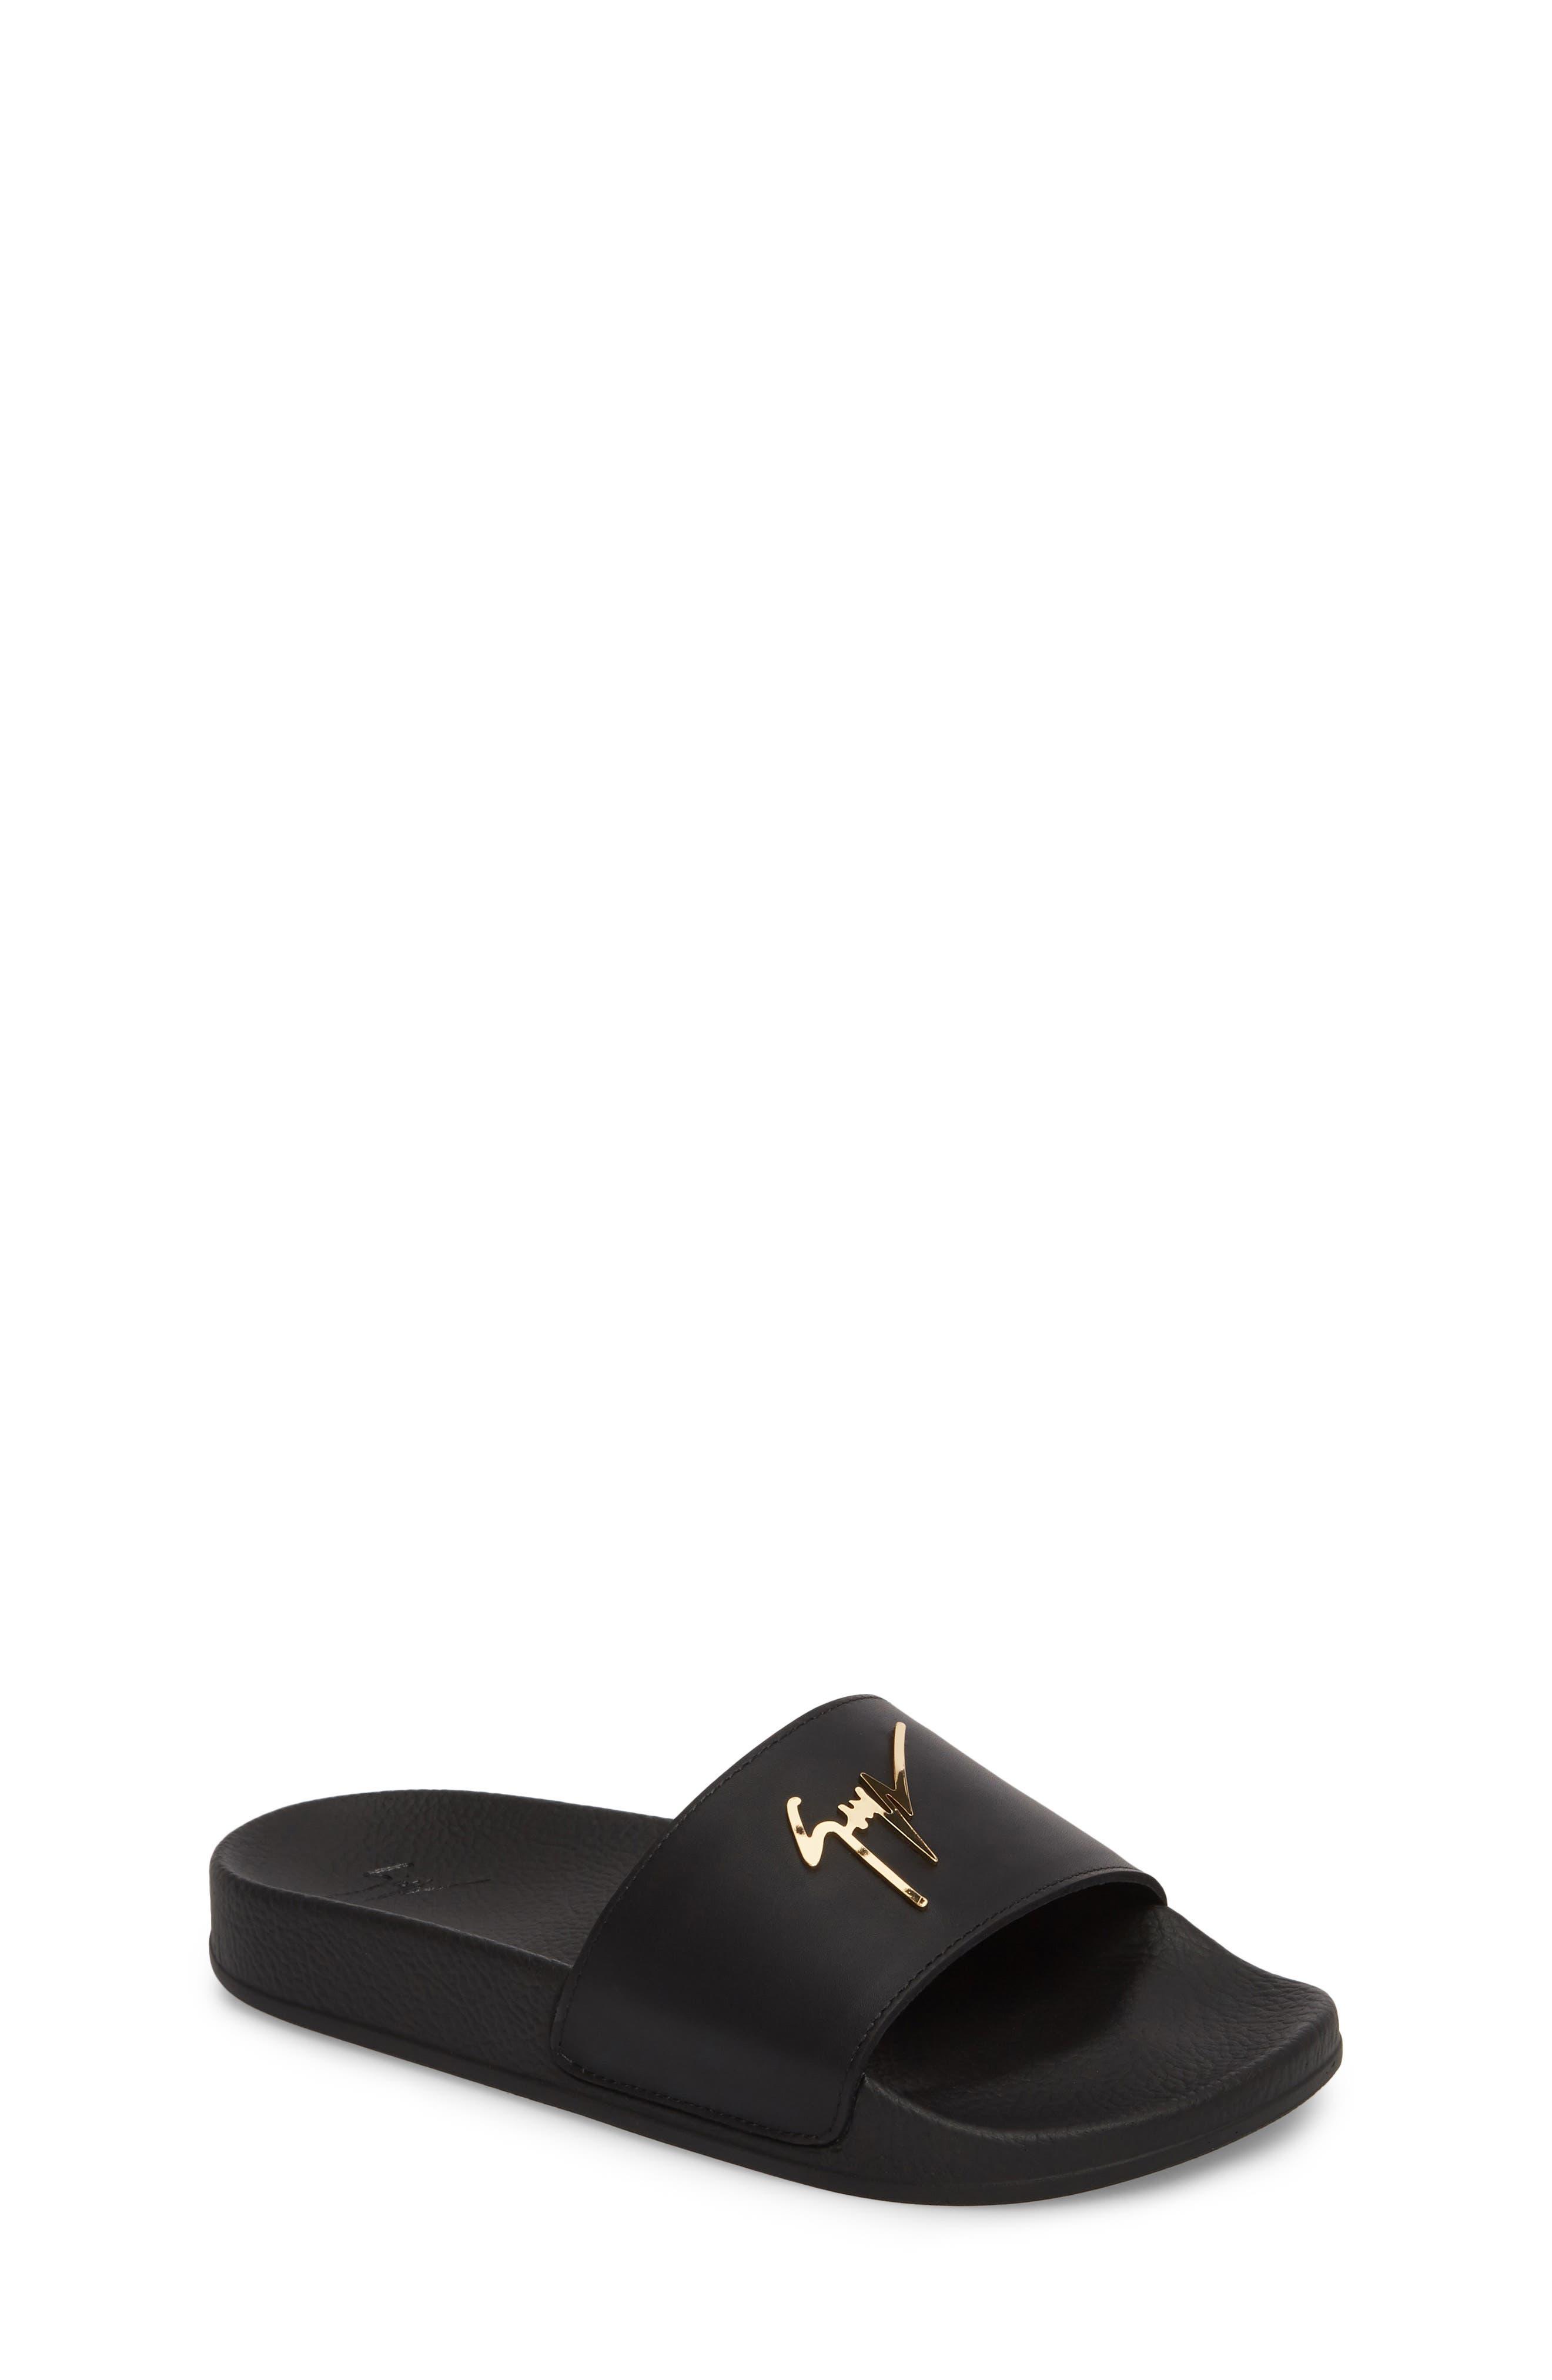 Birel Slide Sandal,                             Main thumbnail 1, color,                             Black Leather